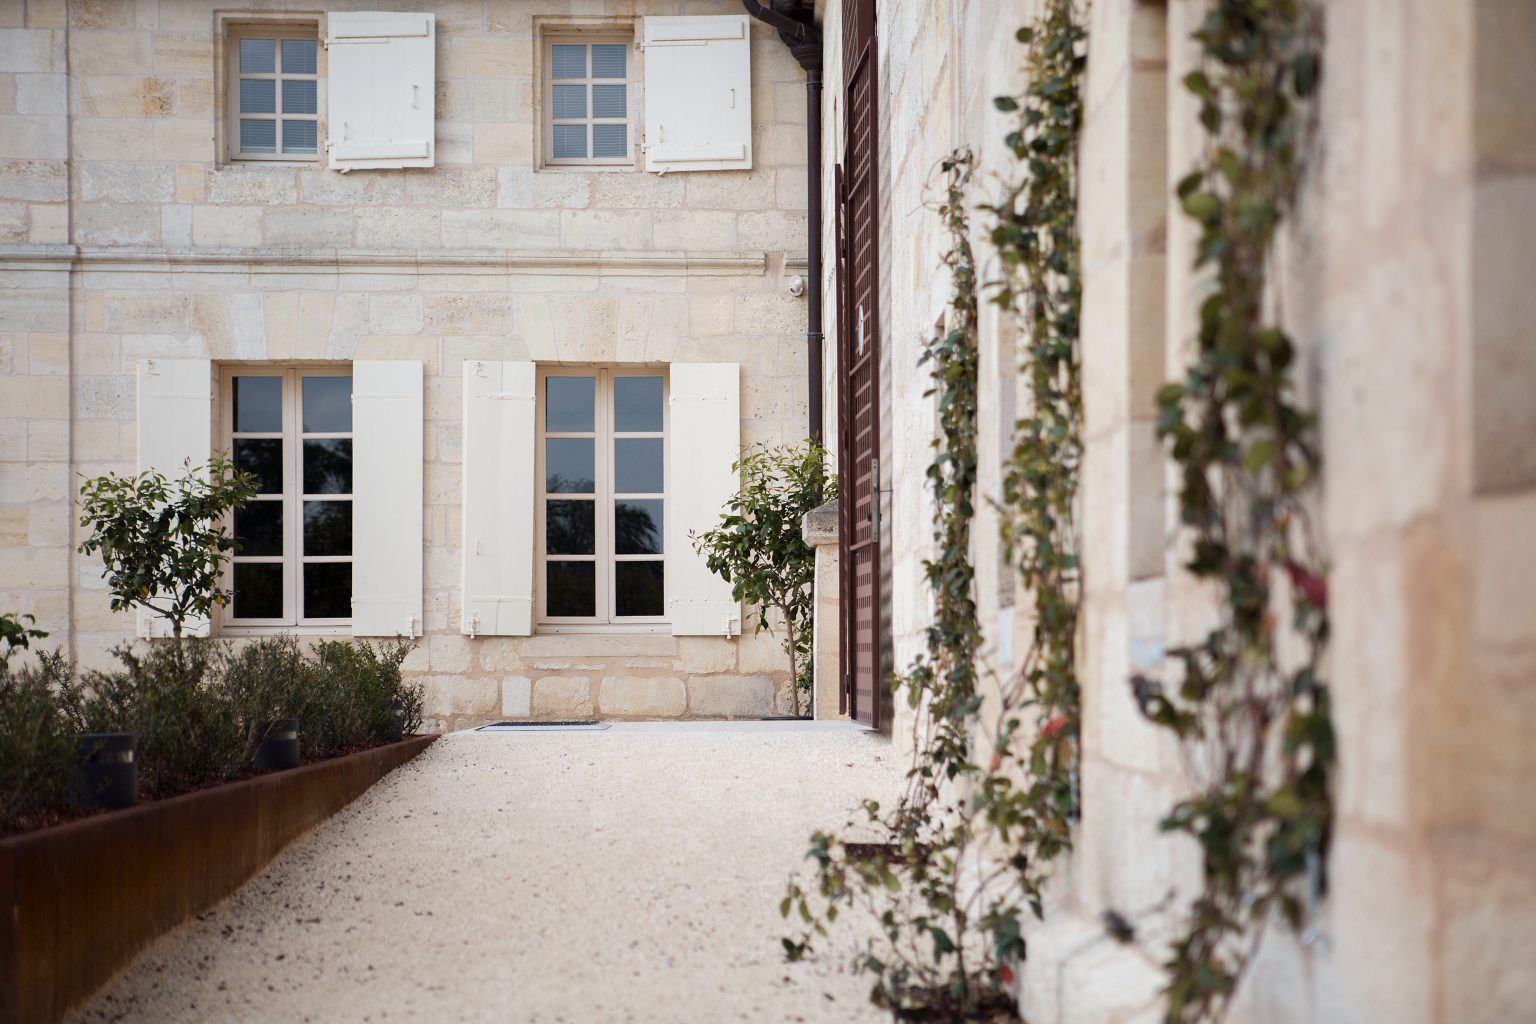 A new chapter - Château Franc Mayne - Château Franc Mayne